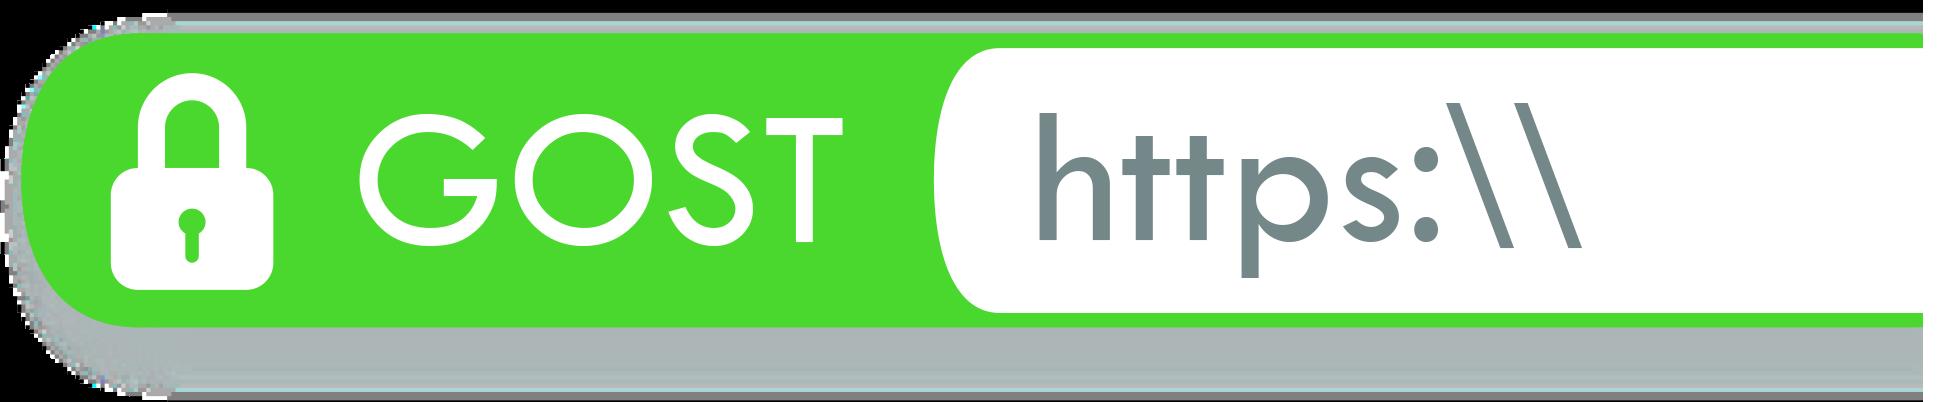 TLS 1.2 и новый ГОСТ